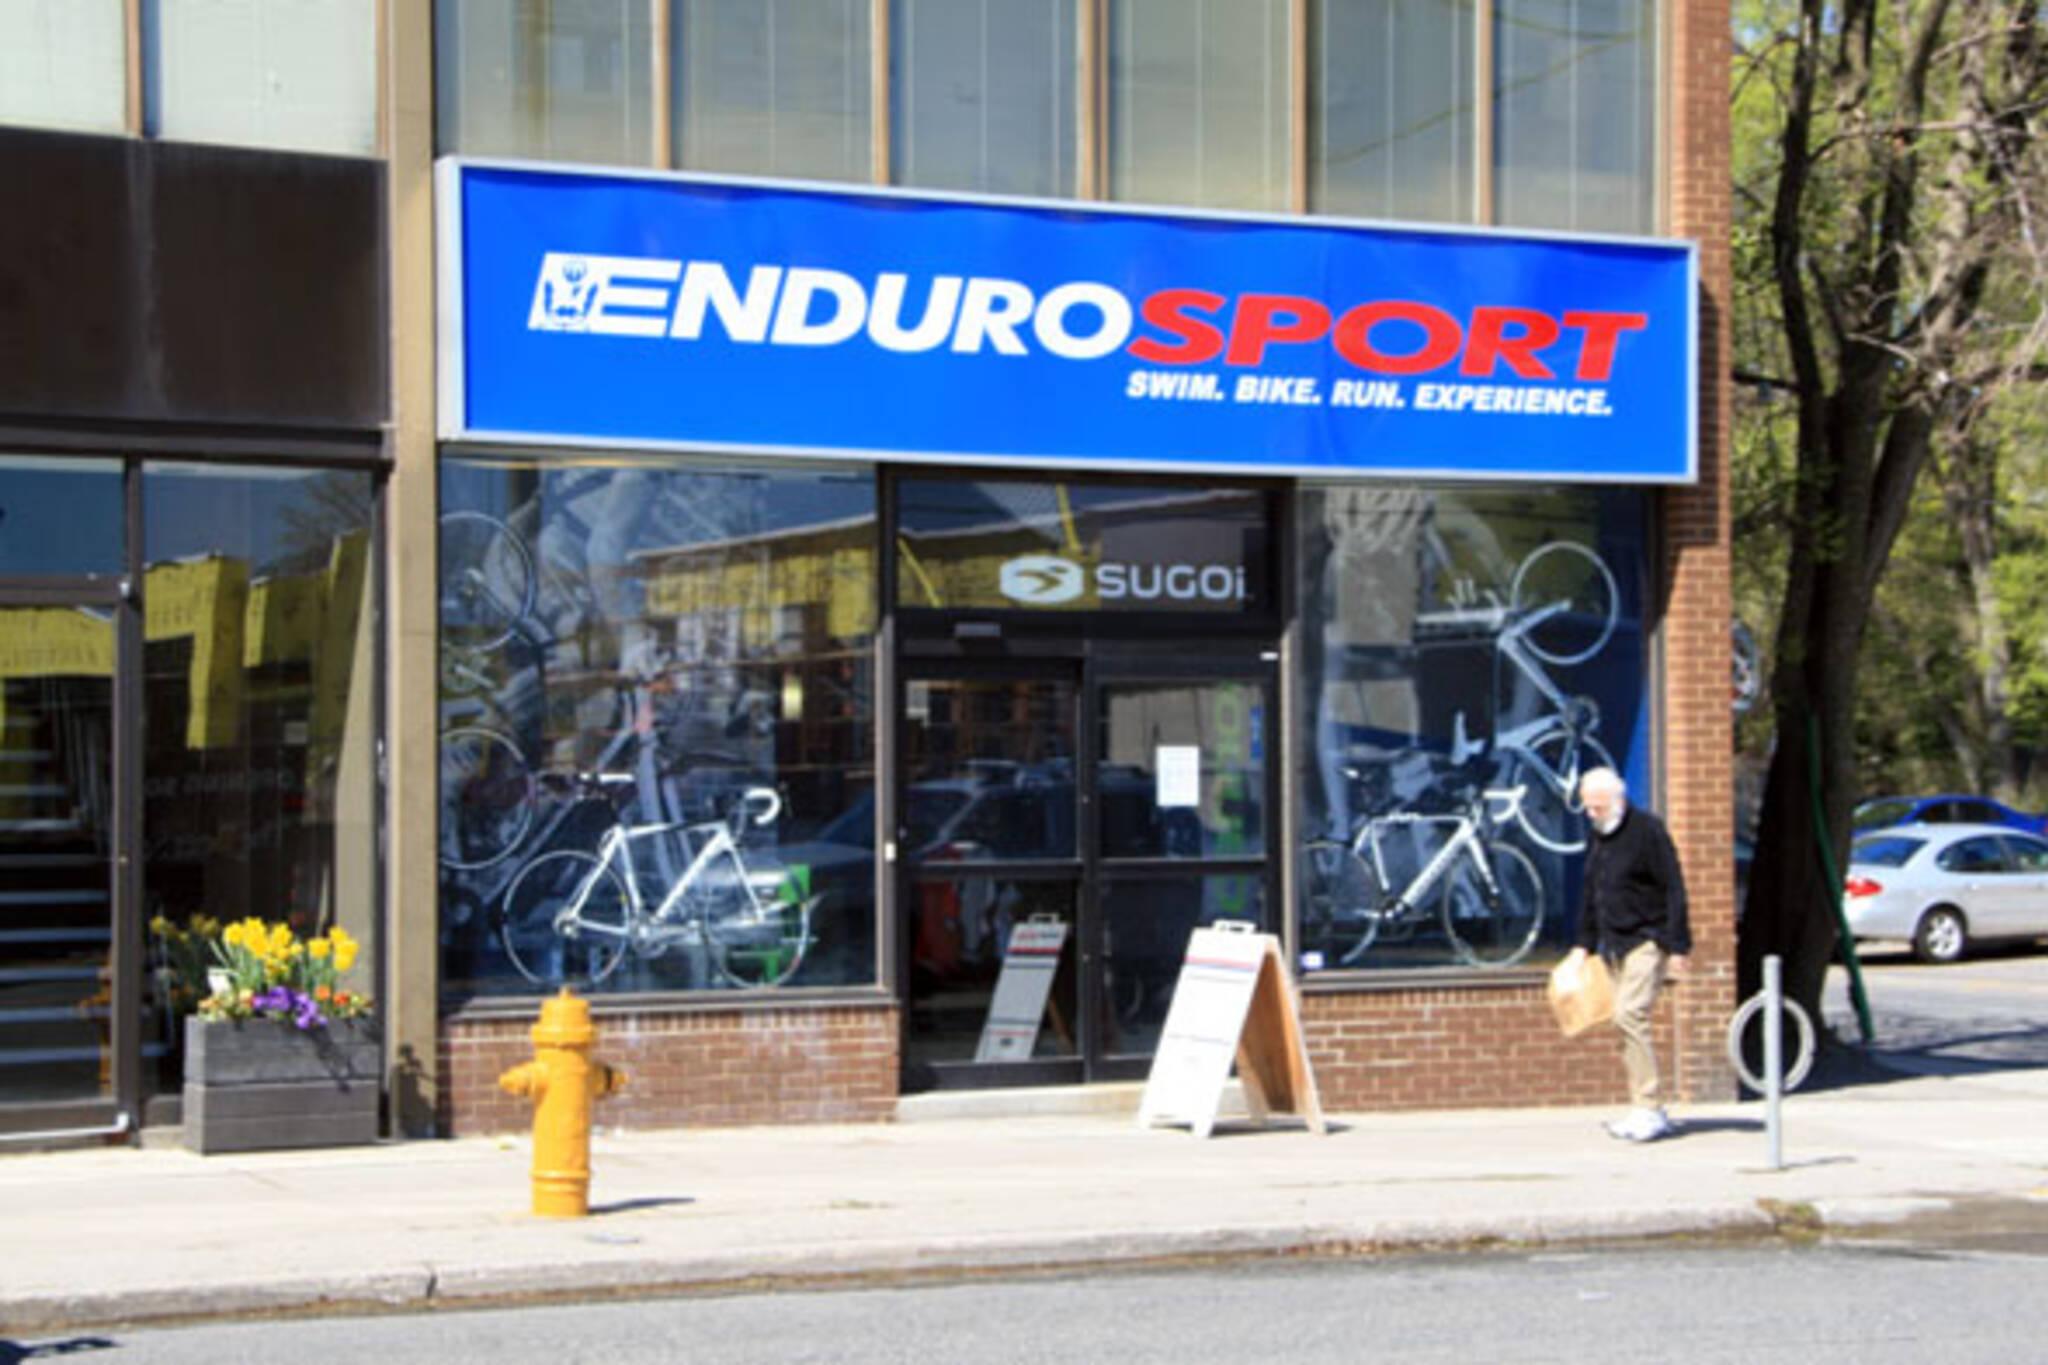 Enduro Sport